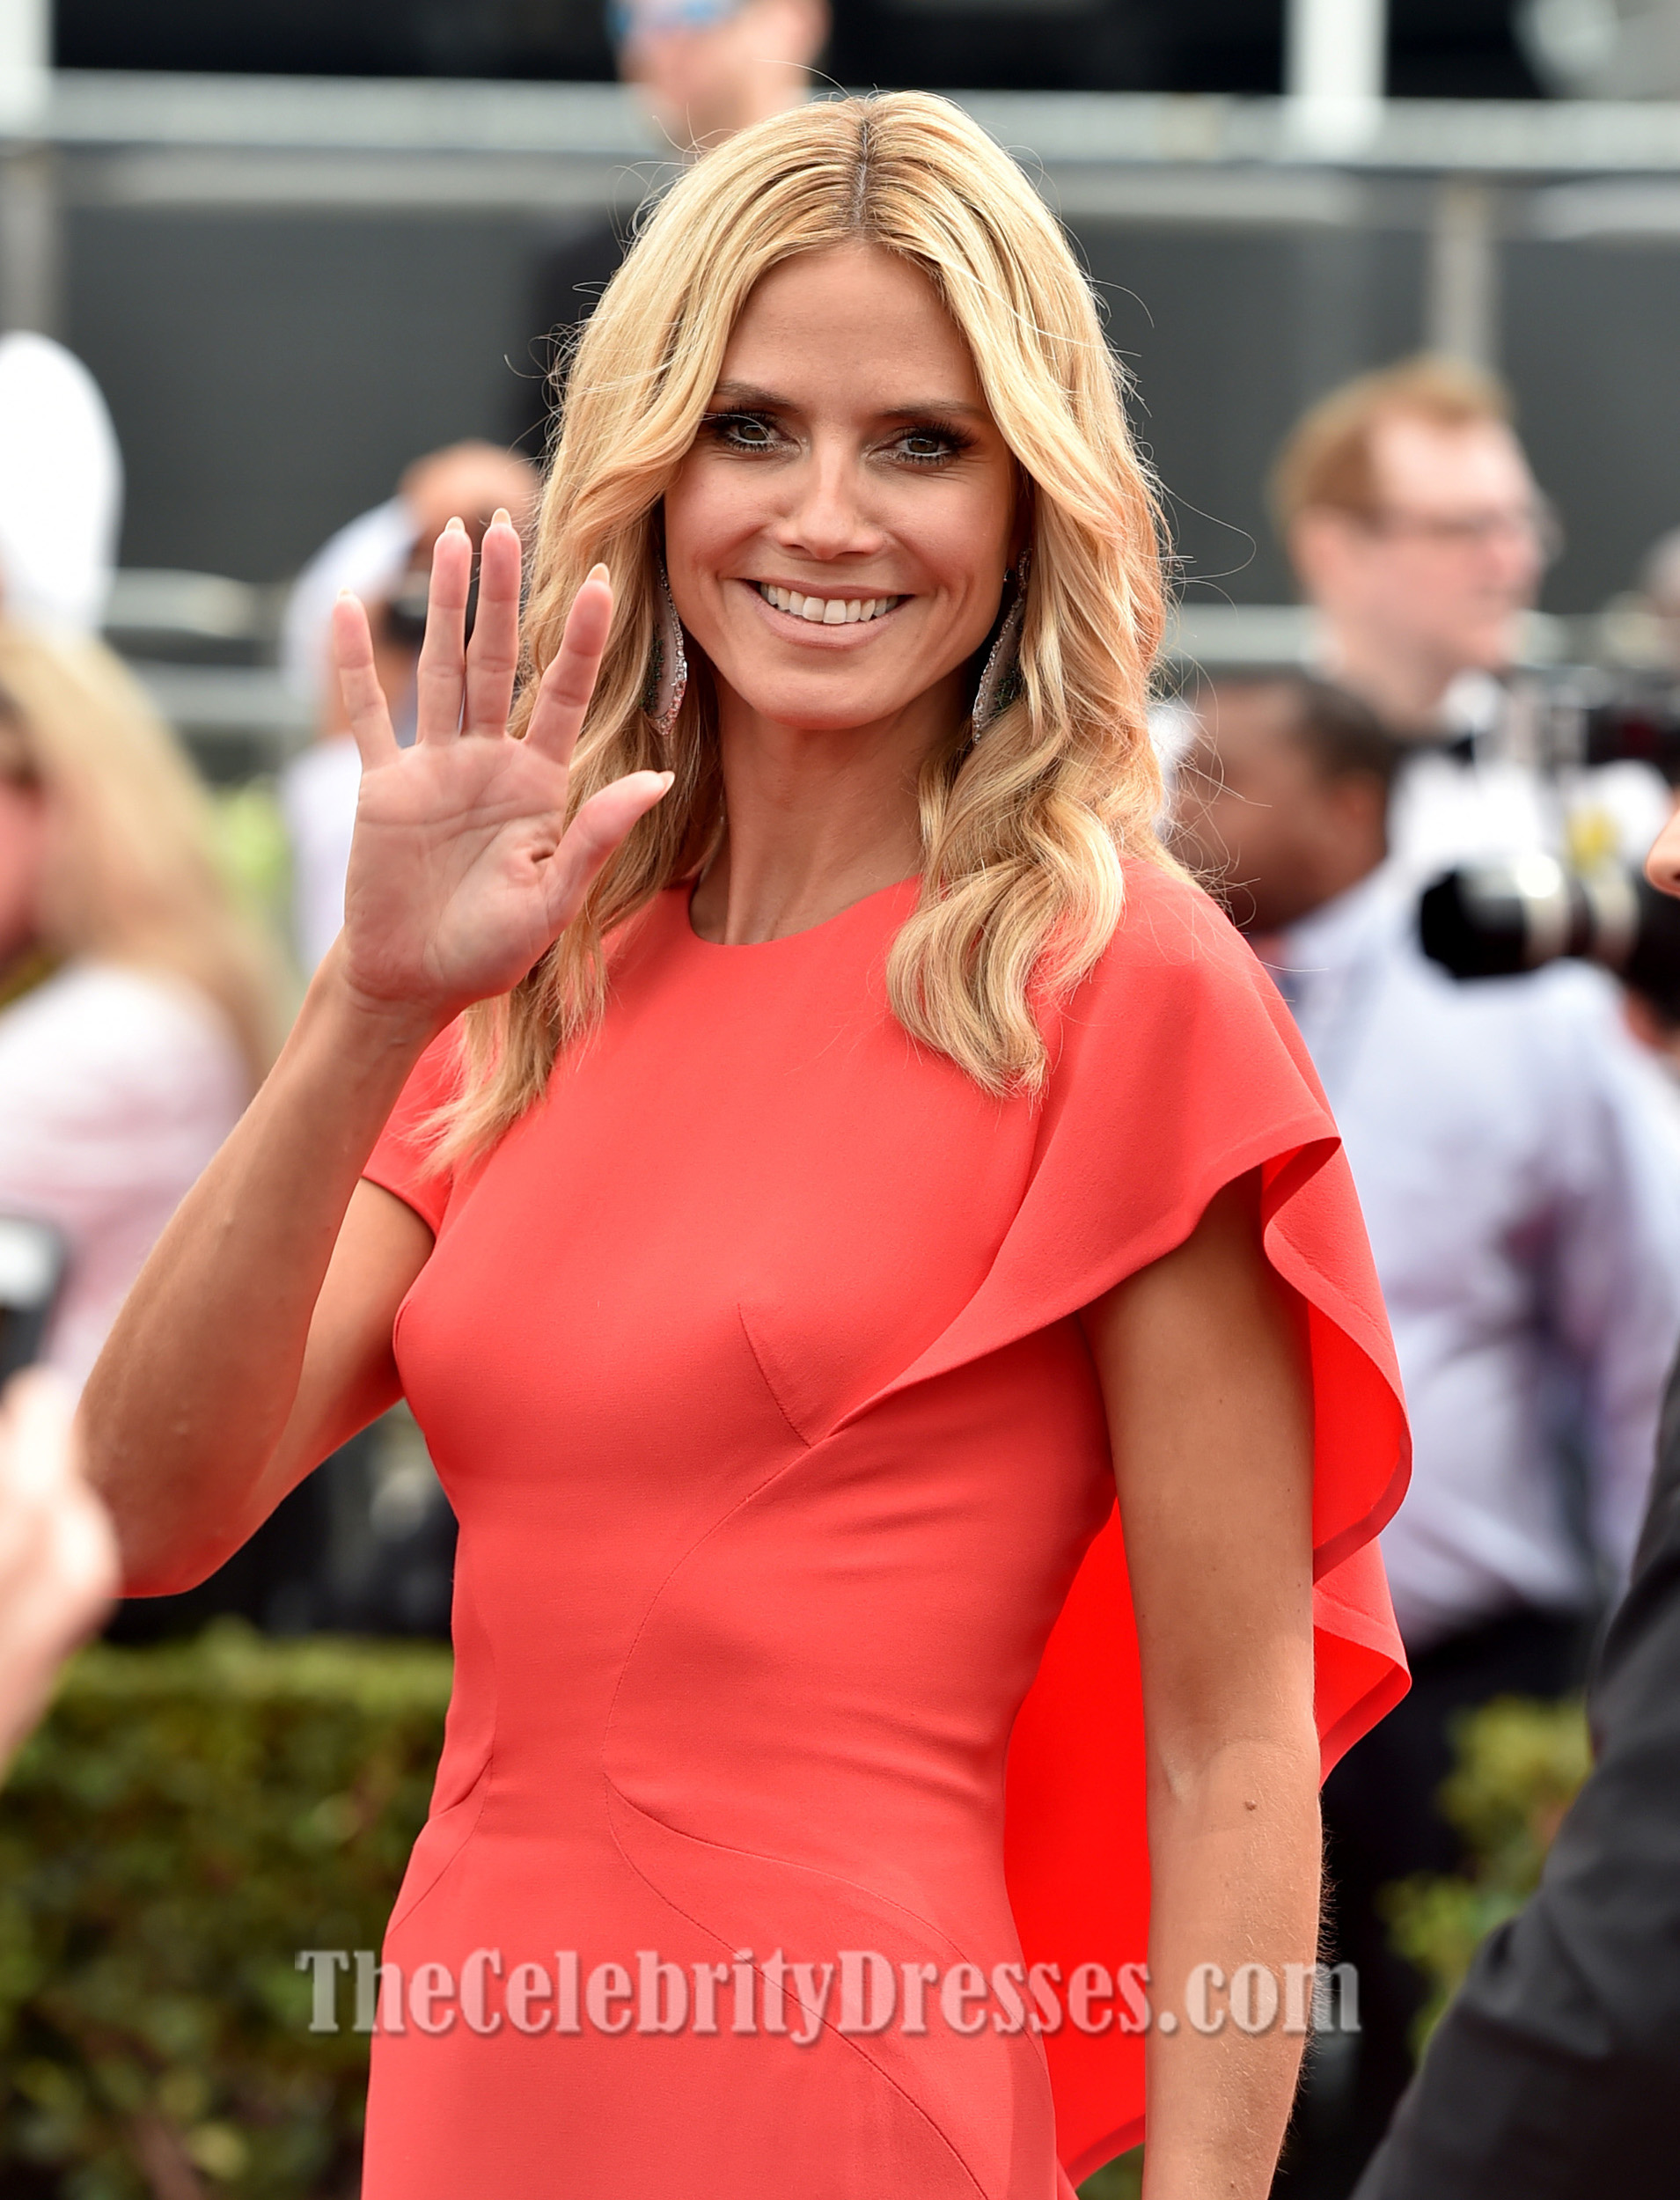 Heidi Klum Watermelon Formal Dresses 2014 Emmy Awards Red ...